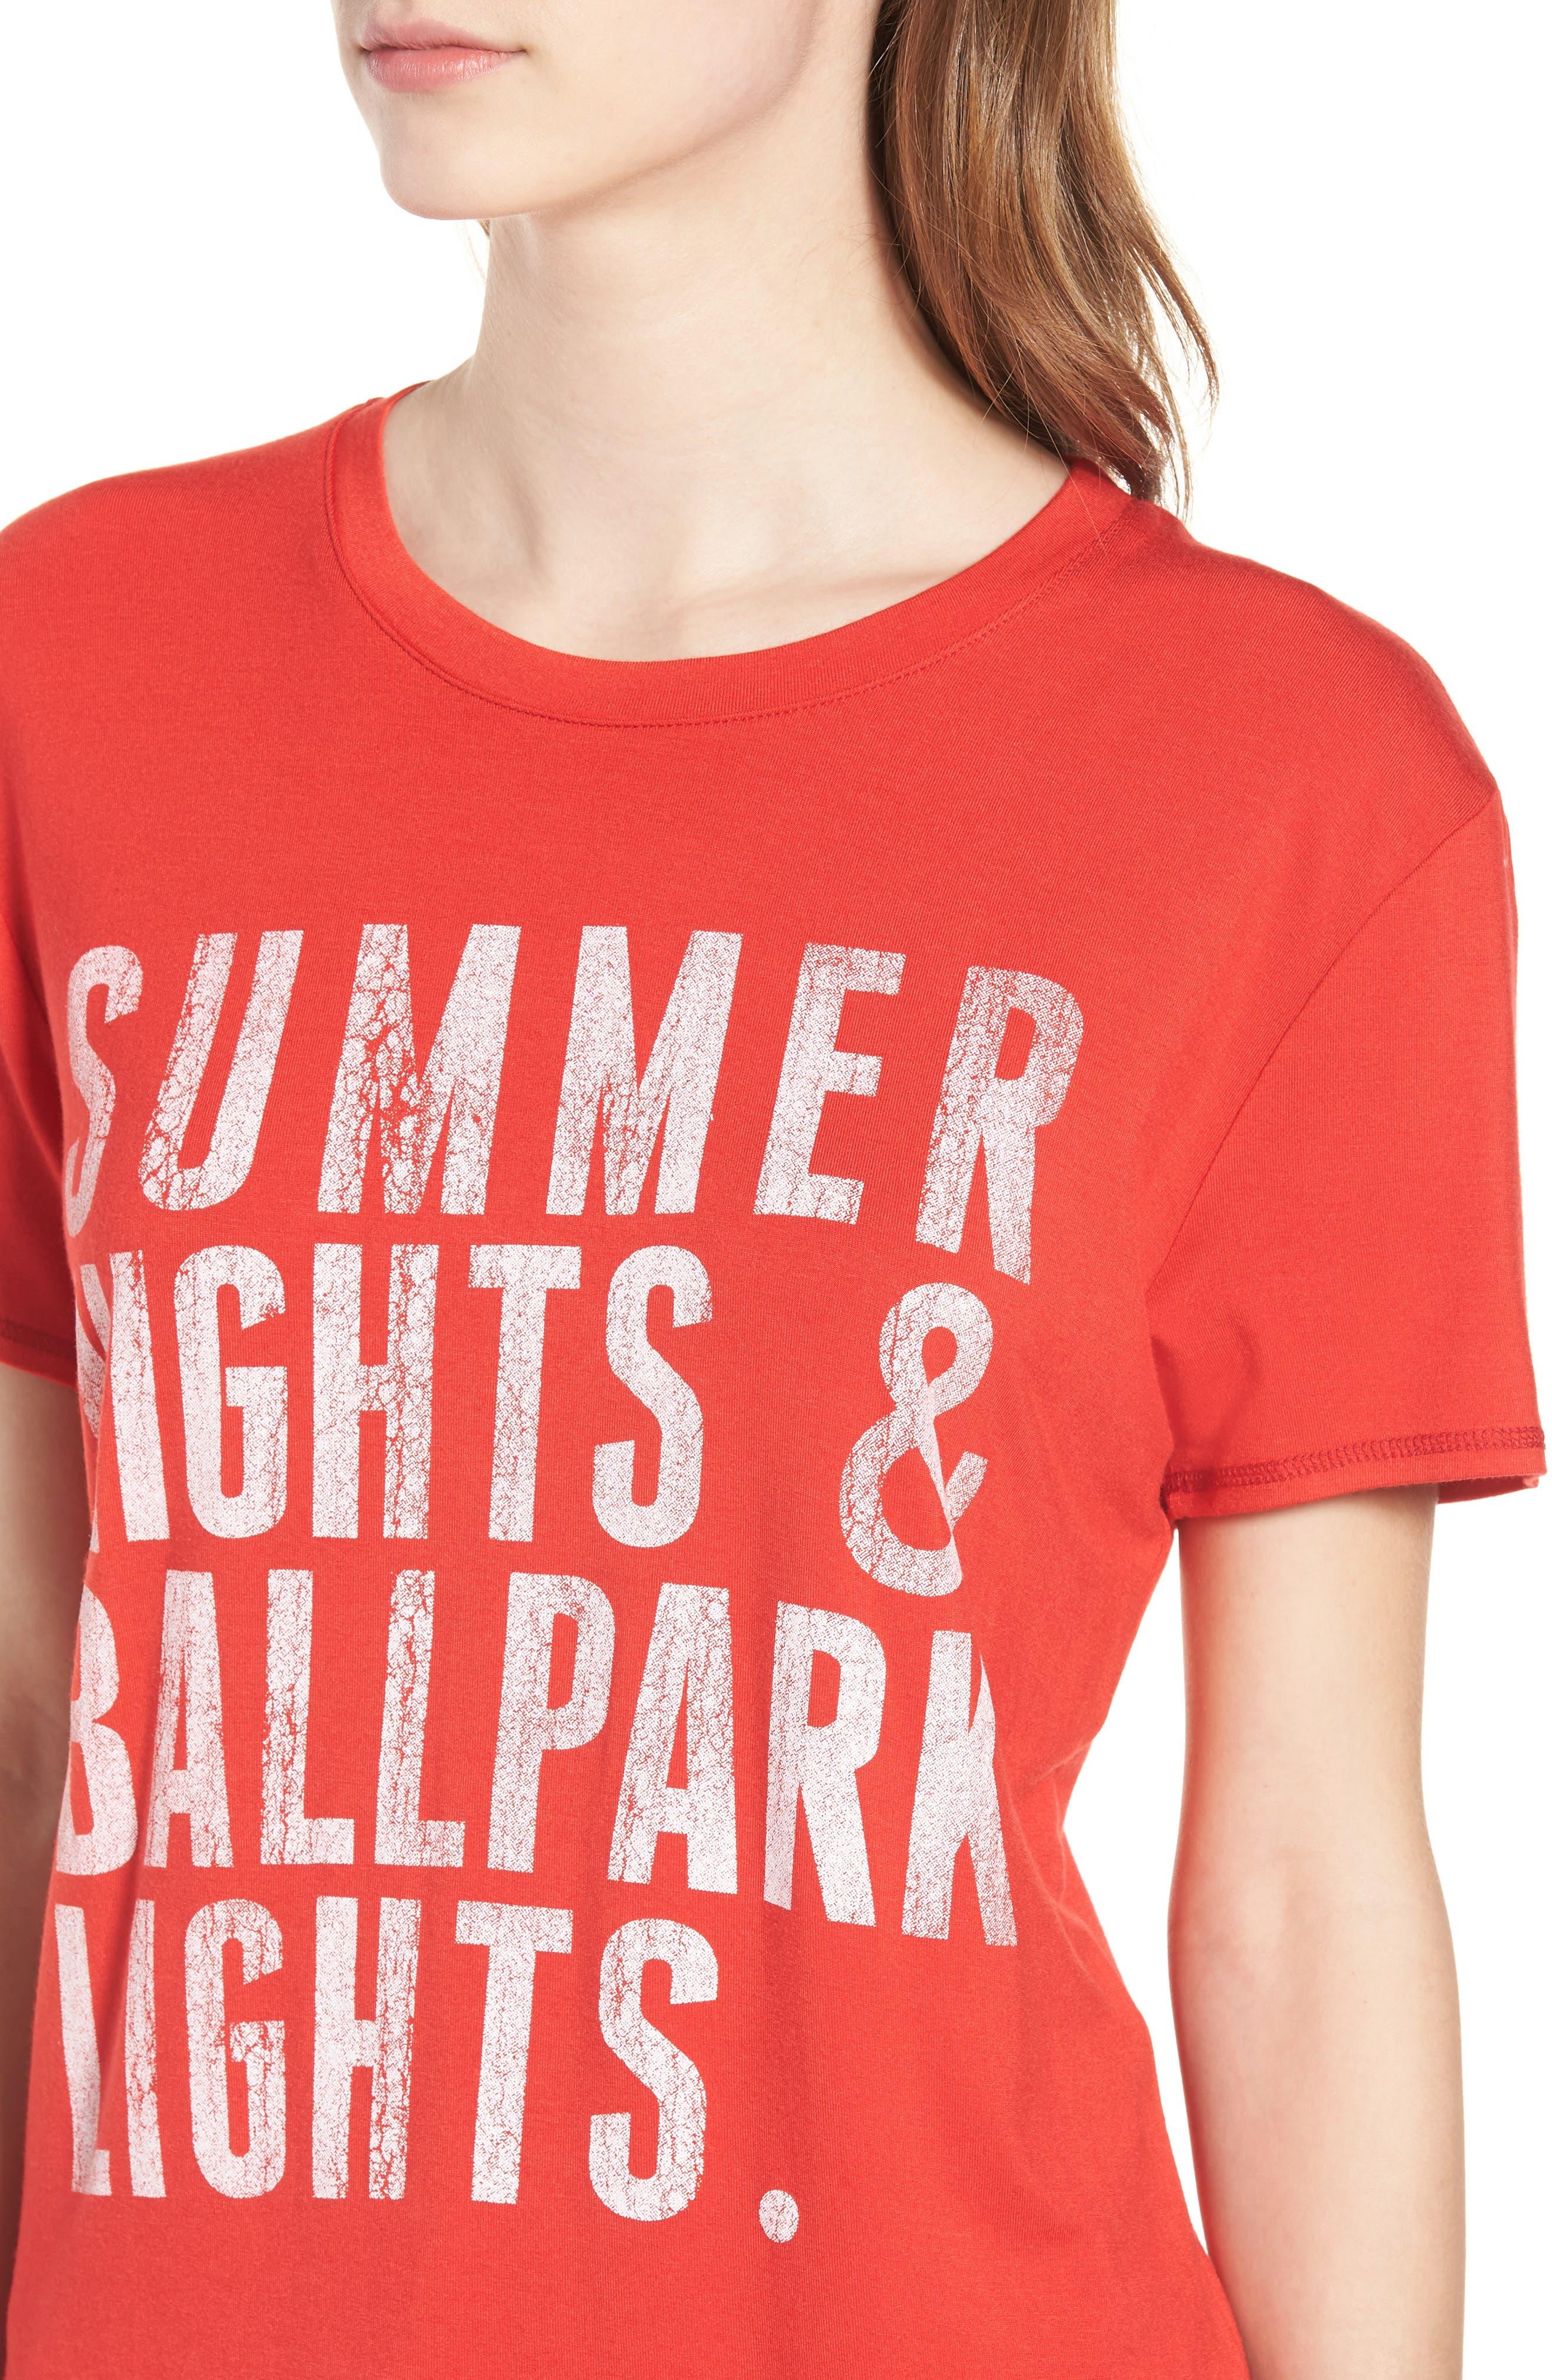 Summer Nights & Ballpark Lights Tee,                             Alternate thumbnail 4, color,                             600